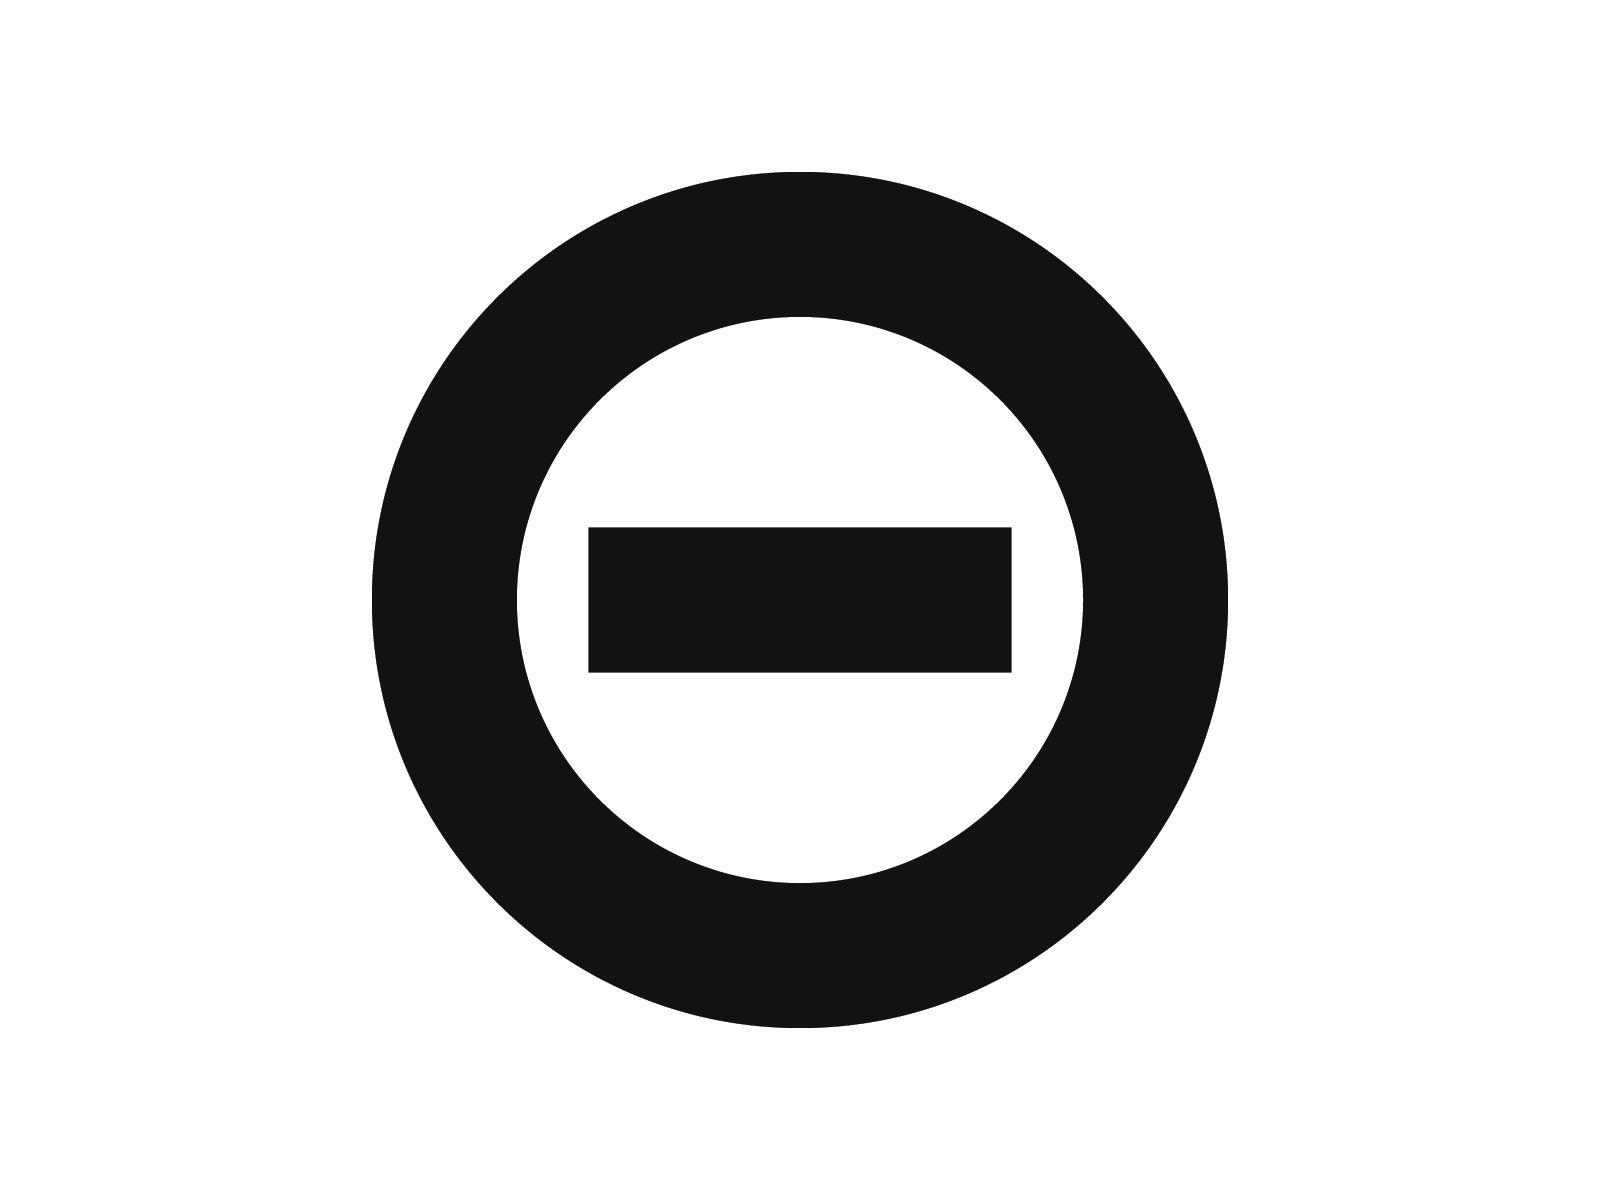 Pin By Rosemary Passantino On Band Logos Type O Negative Type O Negative Band Rock Band Logos